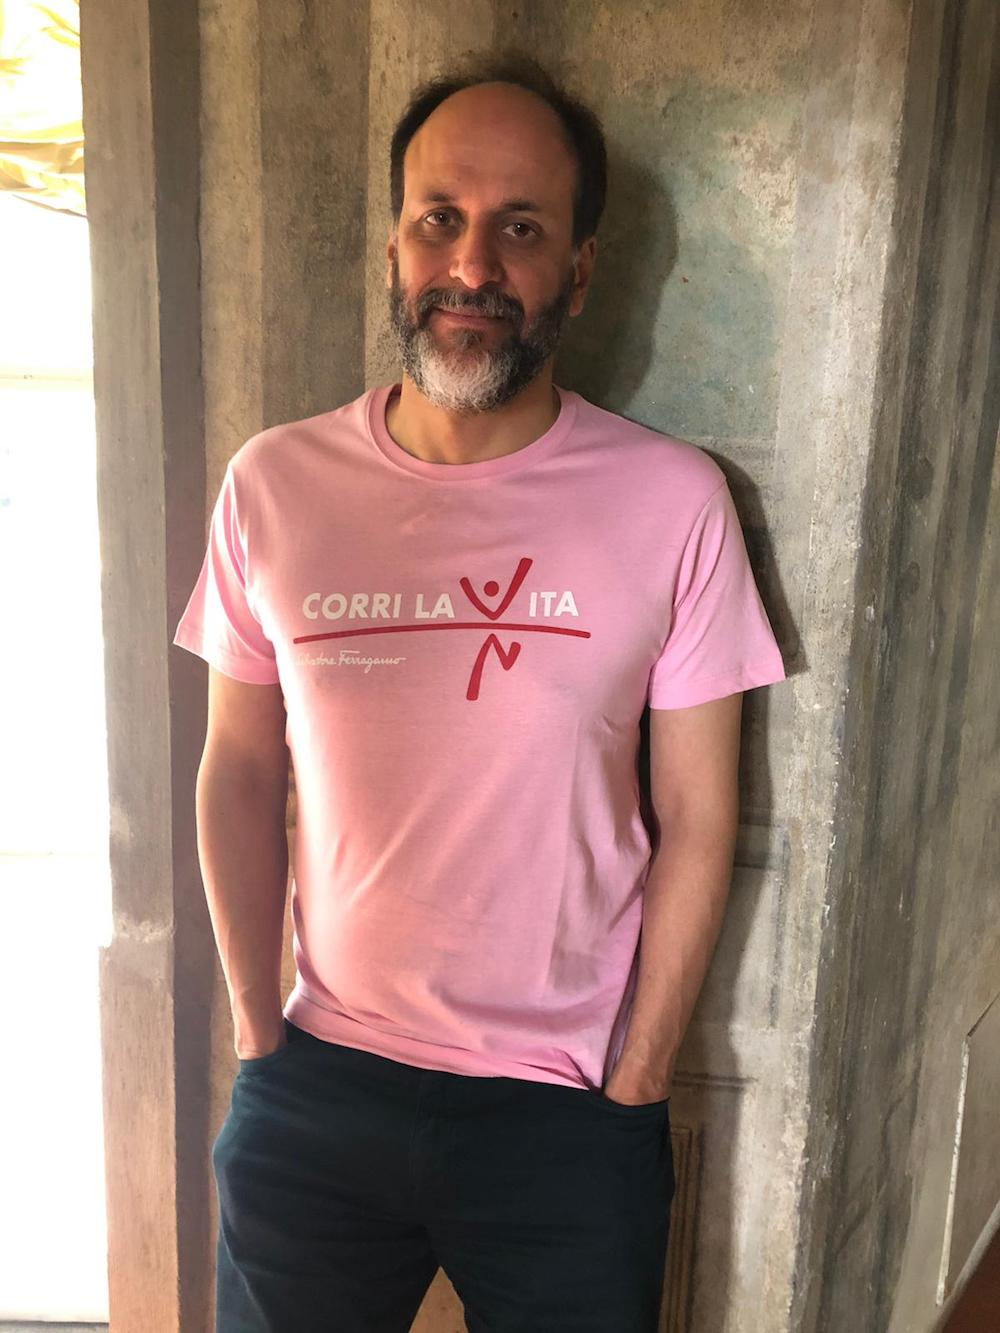 Luca Guadagnino_corri la vita 2019